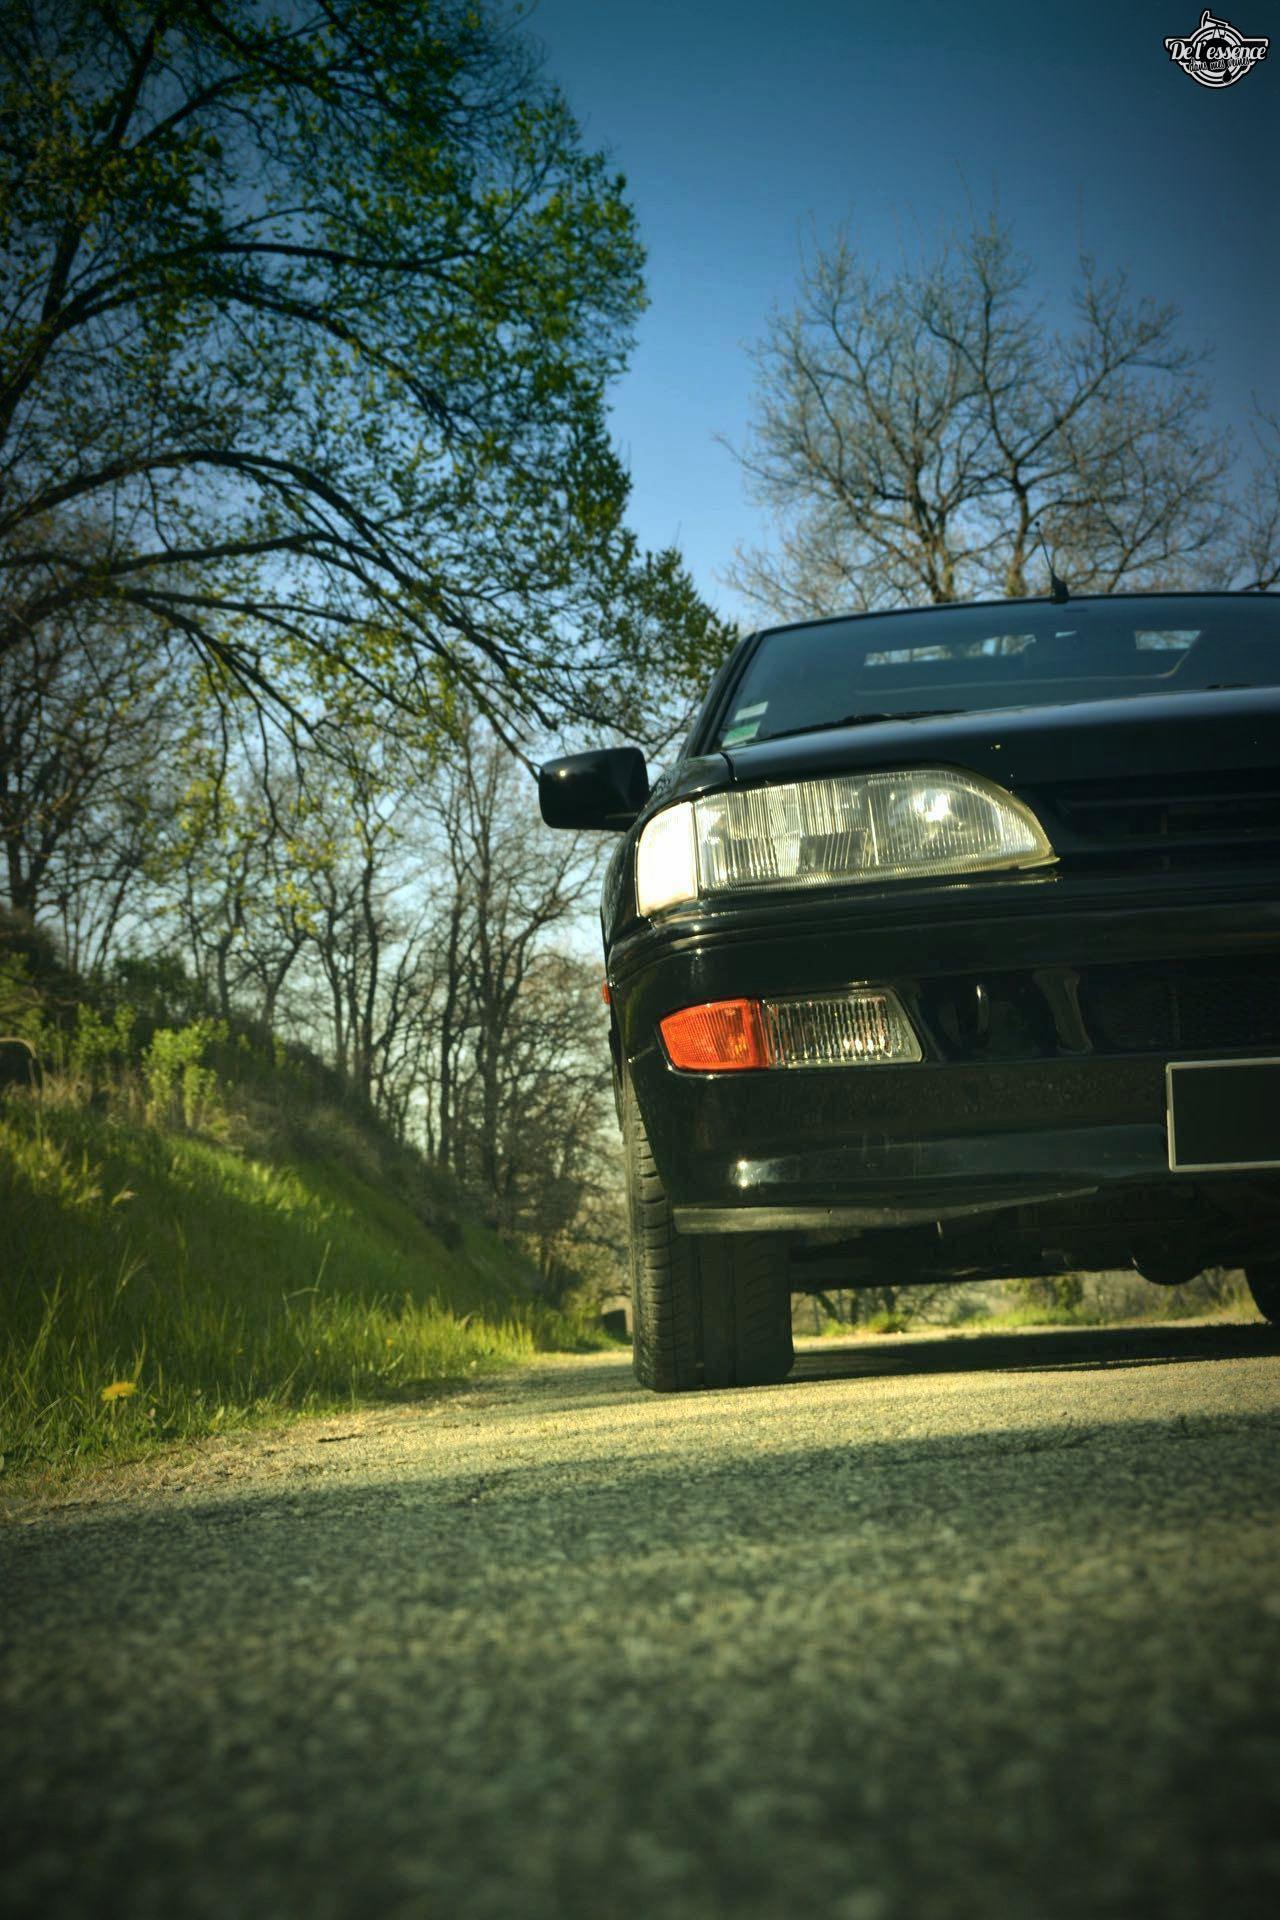 '92 Ford Escort XR3i 16v... Le cul qui glisse ! 21